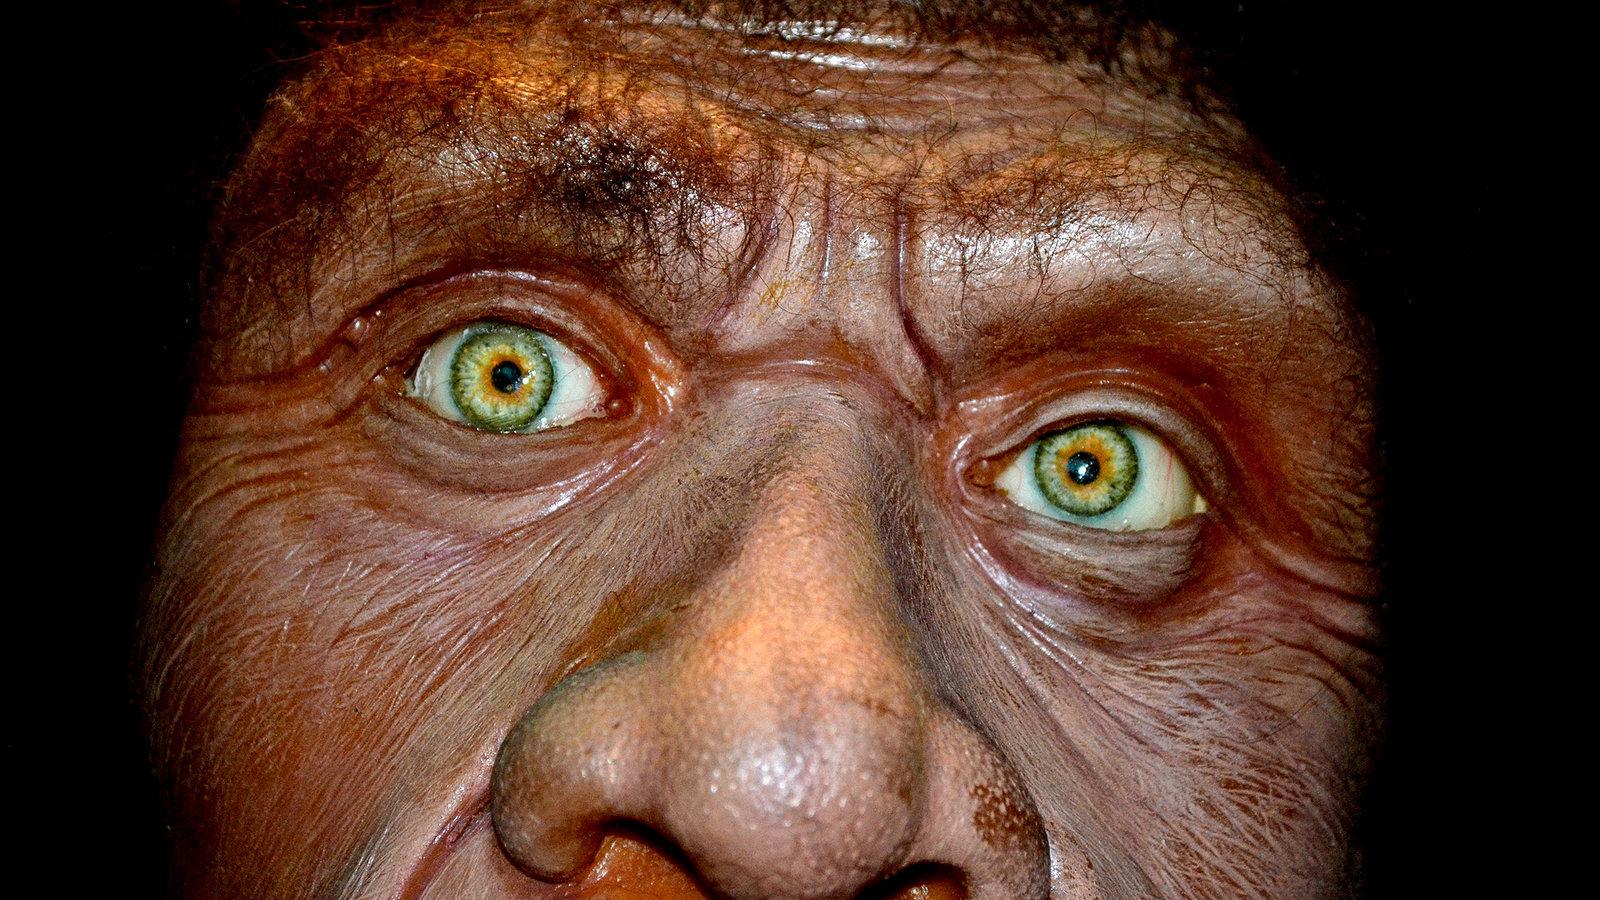 Secrets of the Dead - Caveman Cold Case